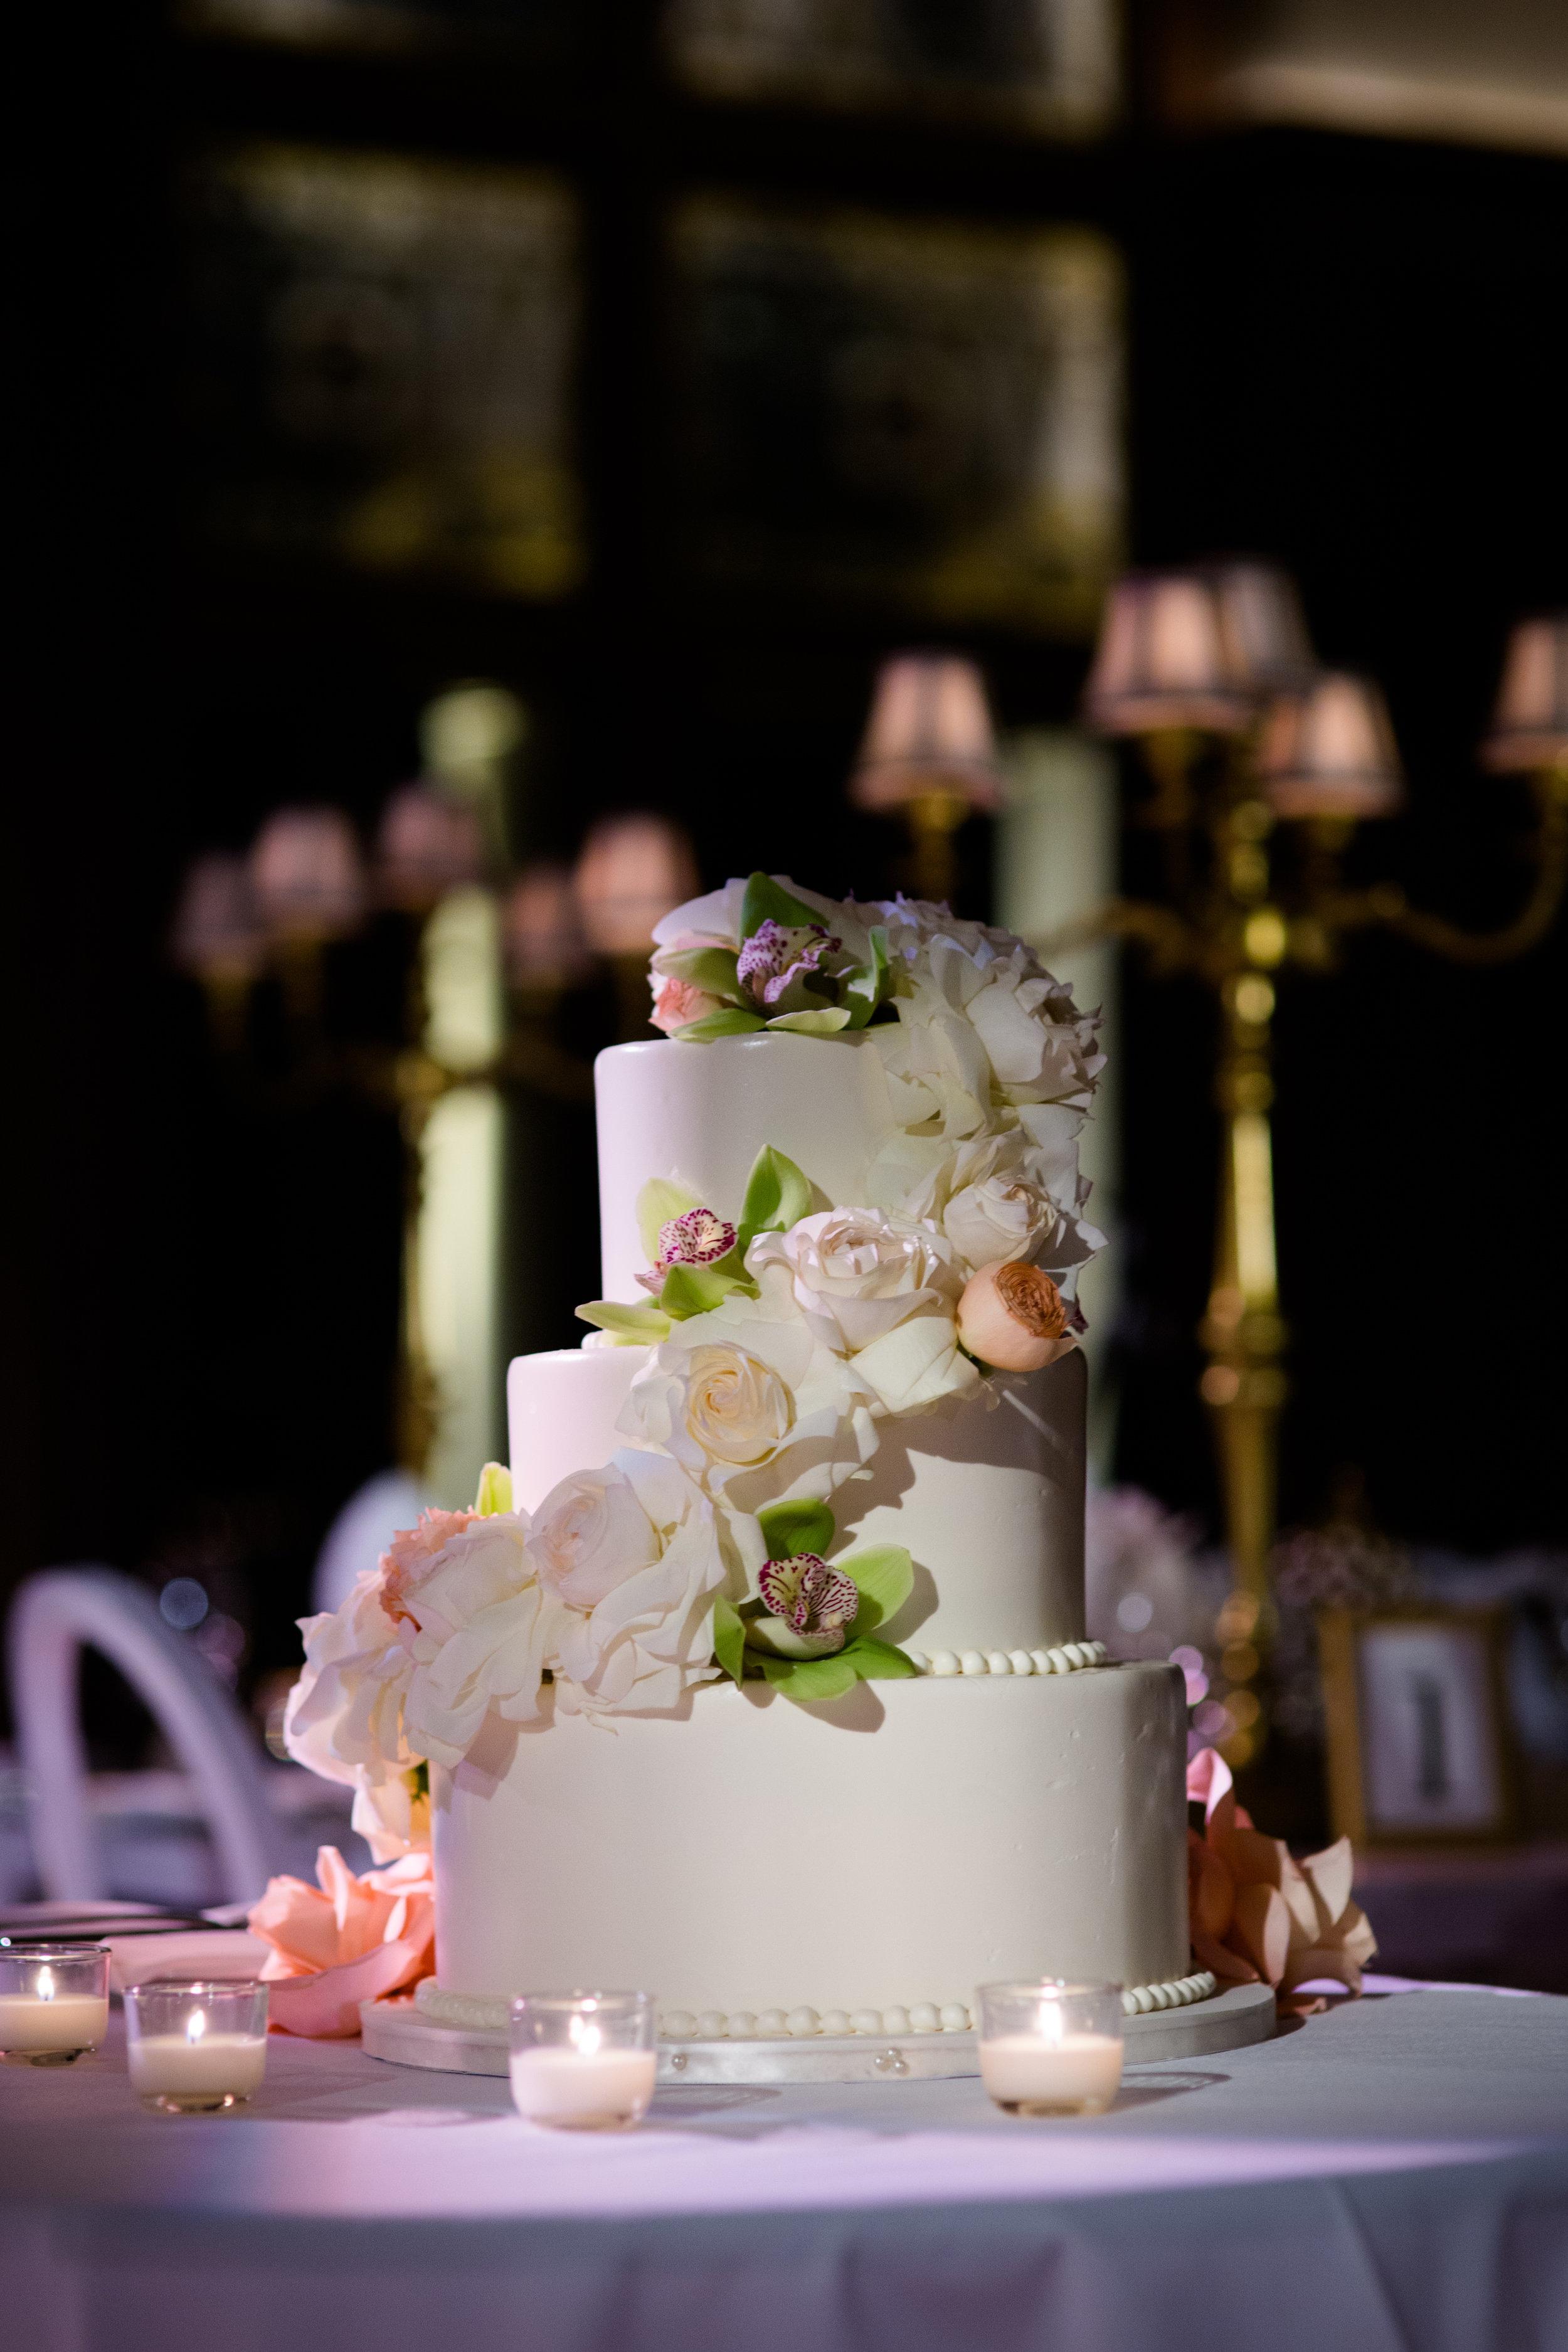 Elegant southern inspired wedding cake at Chicago Athletic Association Hotel